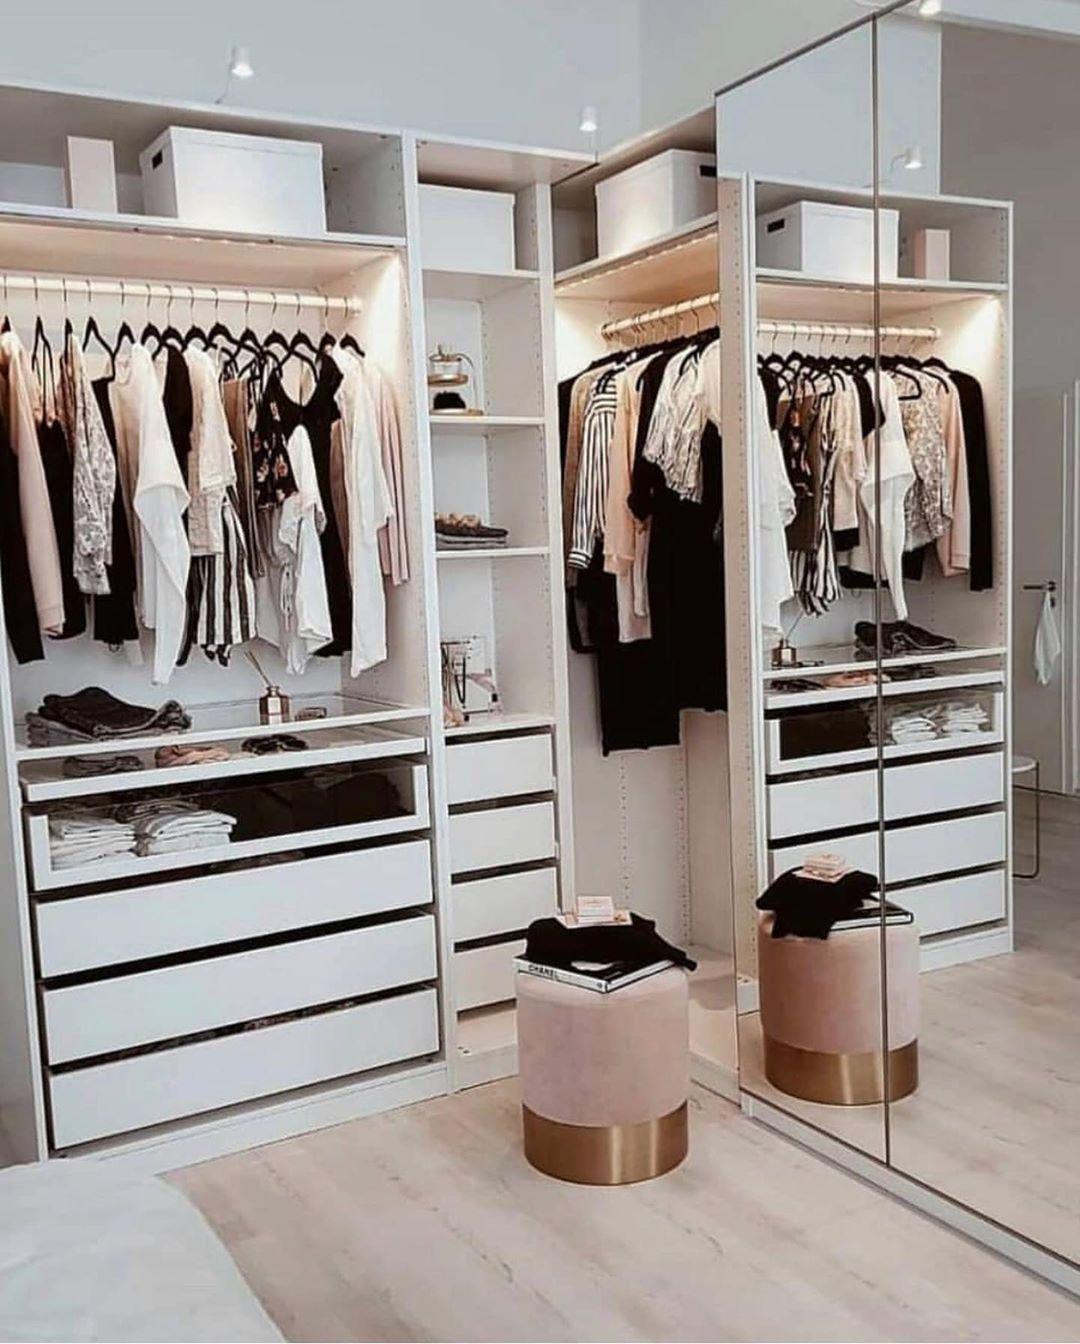 Best Dressing Room Wardrobe Goals Follow Houseofhomes101 For 640 x 480